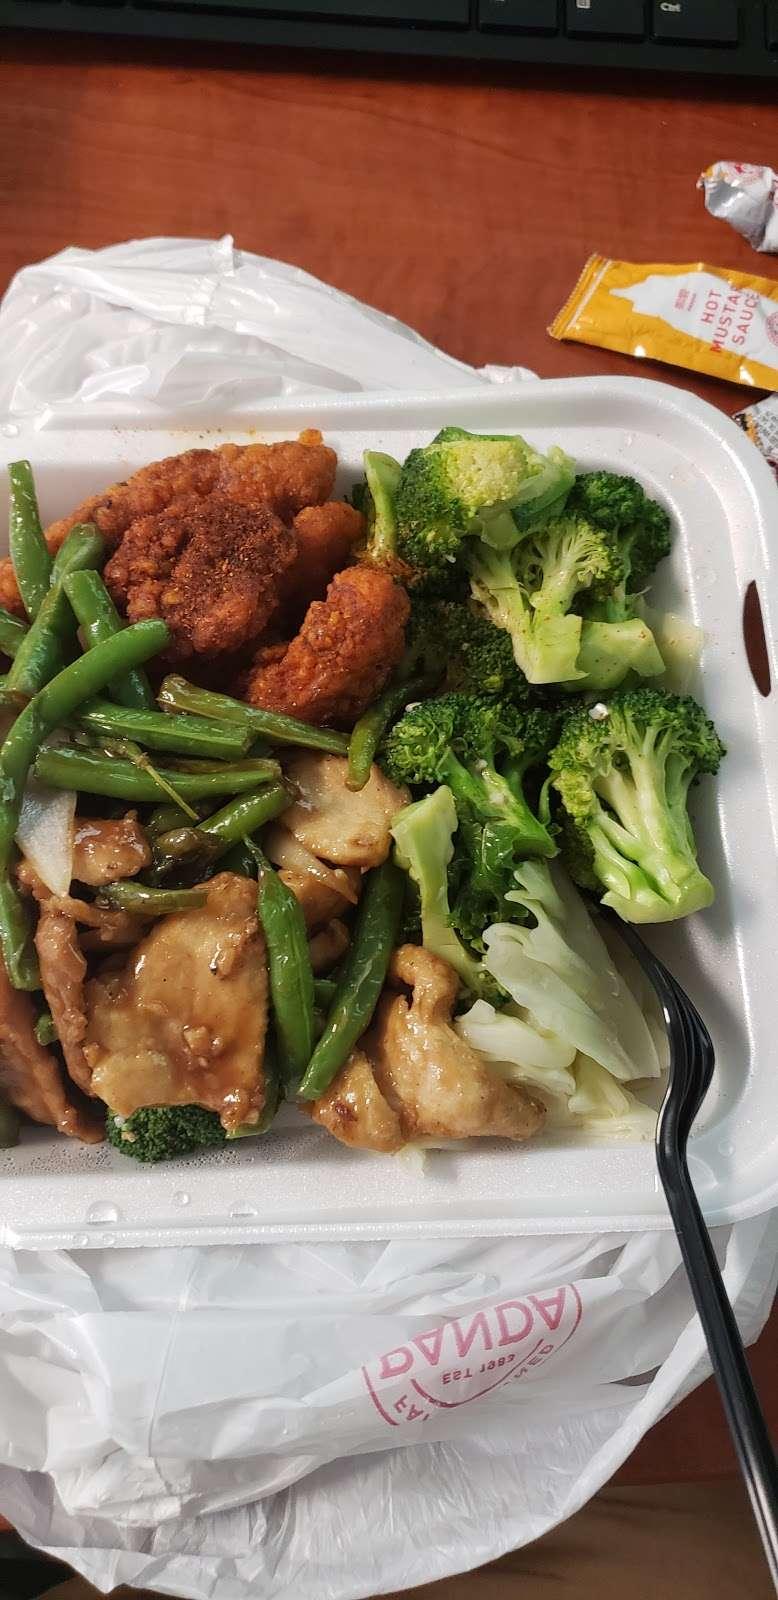 Panda Express - restaurant  | Photo 2 of 10 | Address: 13520 W, Paxton St, Pacoima, CA 91331, USA | Phone: (818) 897-6361